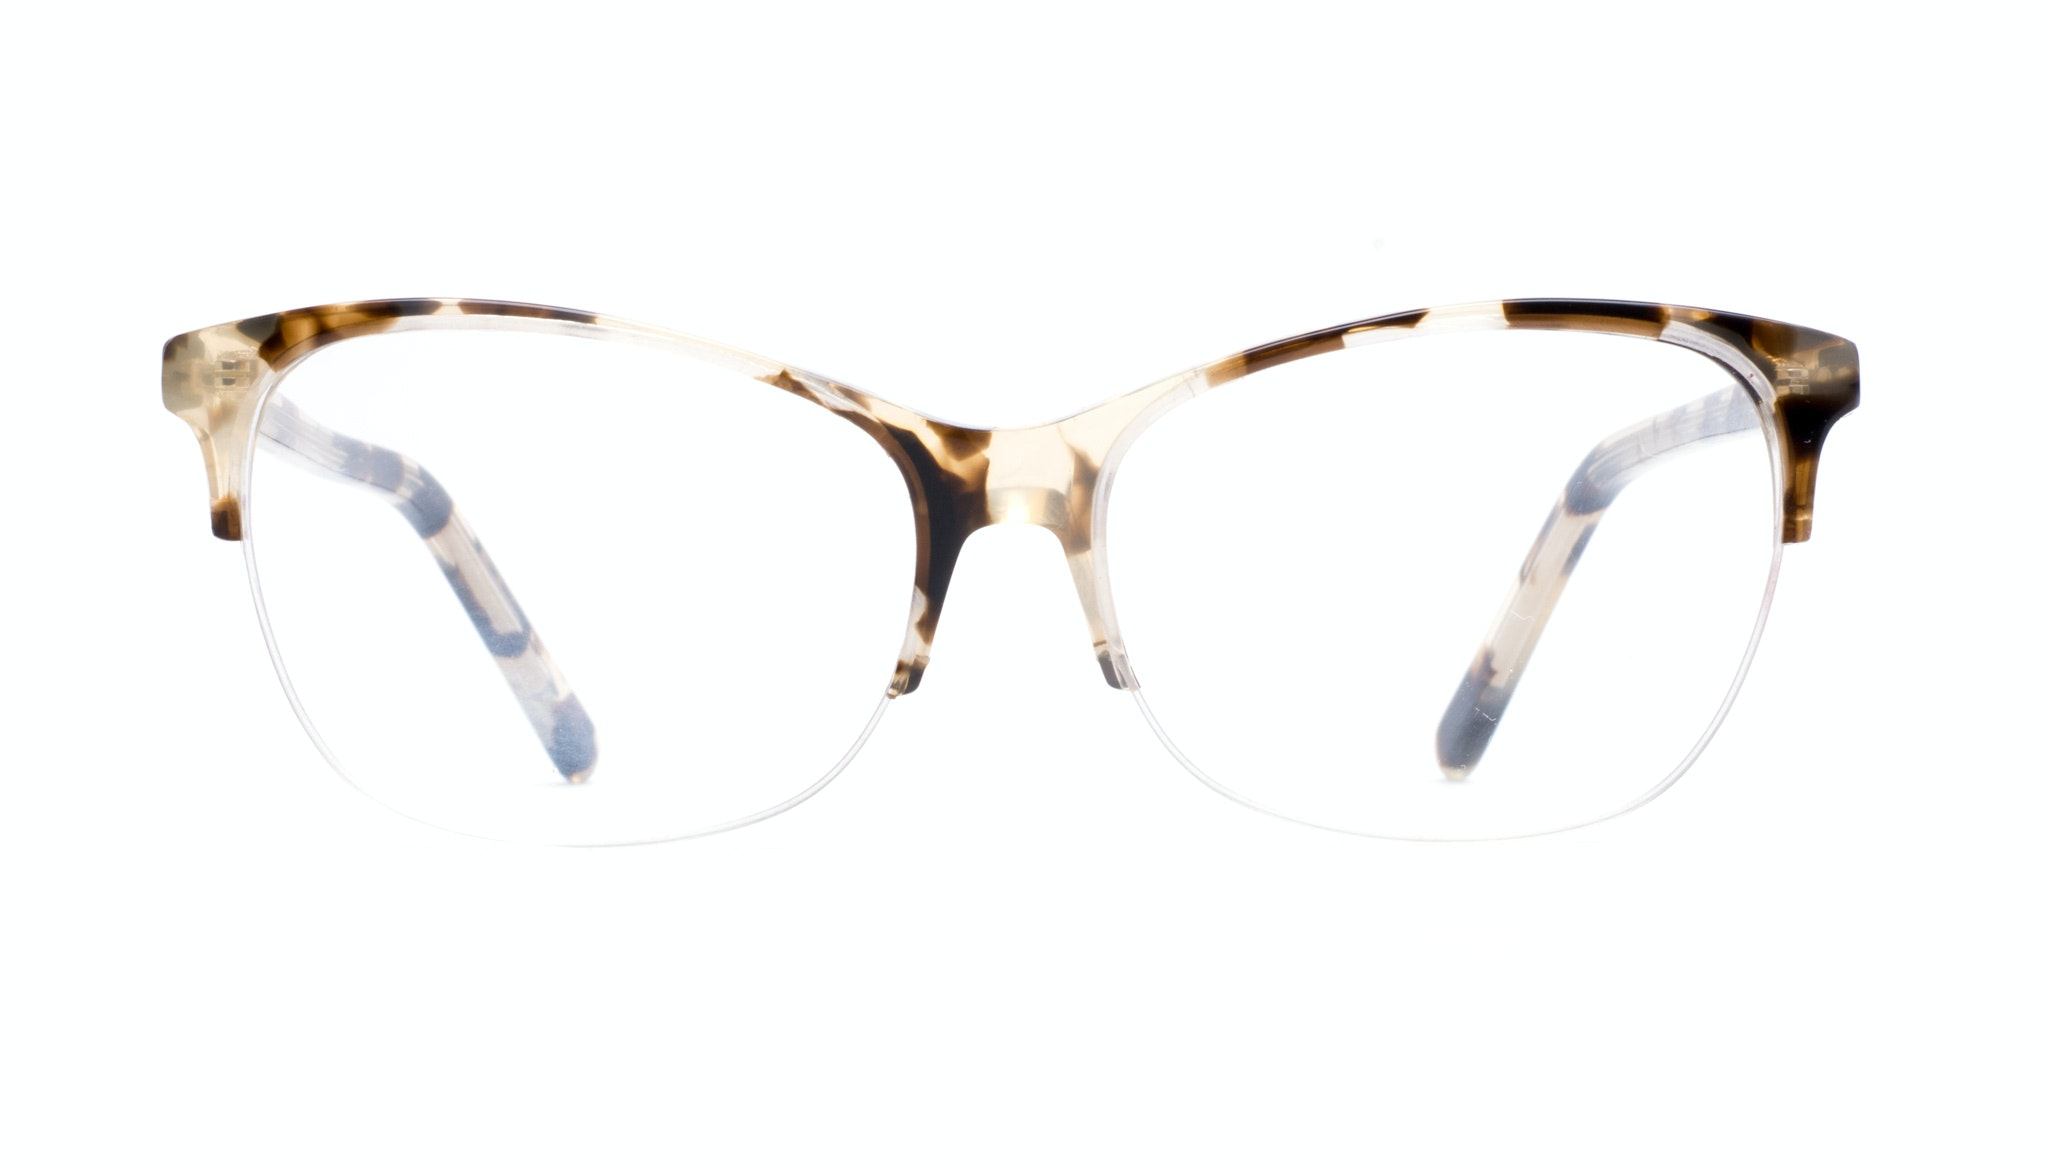 Affordable Fashion Glasses Cat Eye Rectangle Semi-Rimless Eyeglasses Women Flair Light Mocha Tortoise II Front